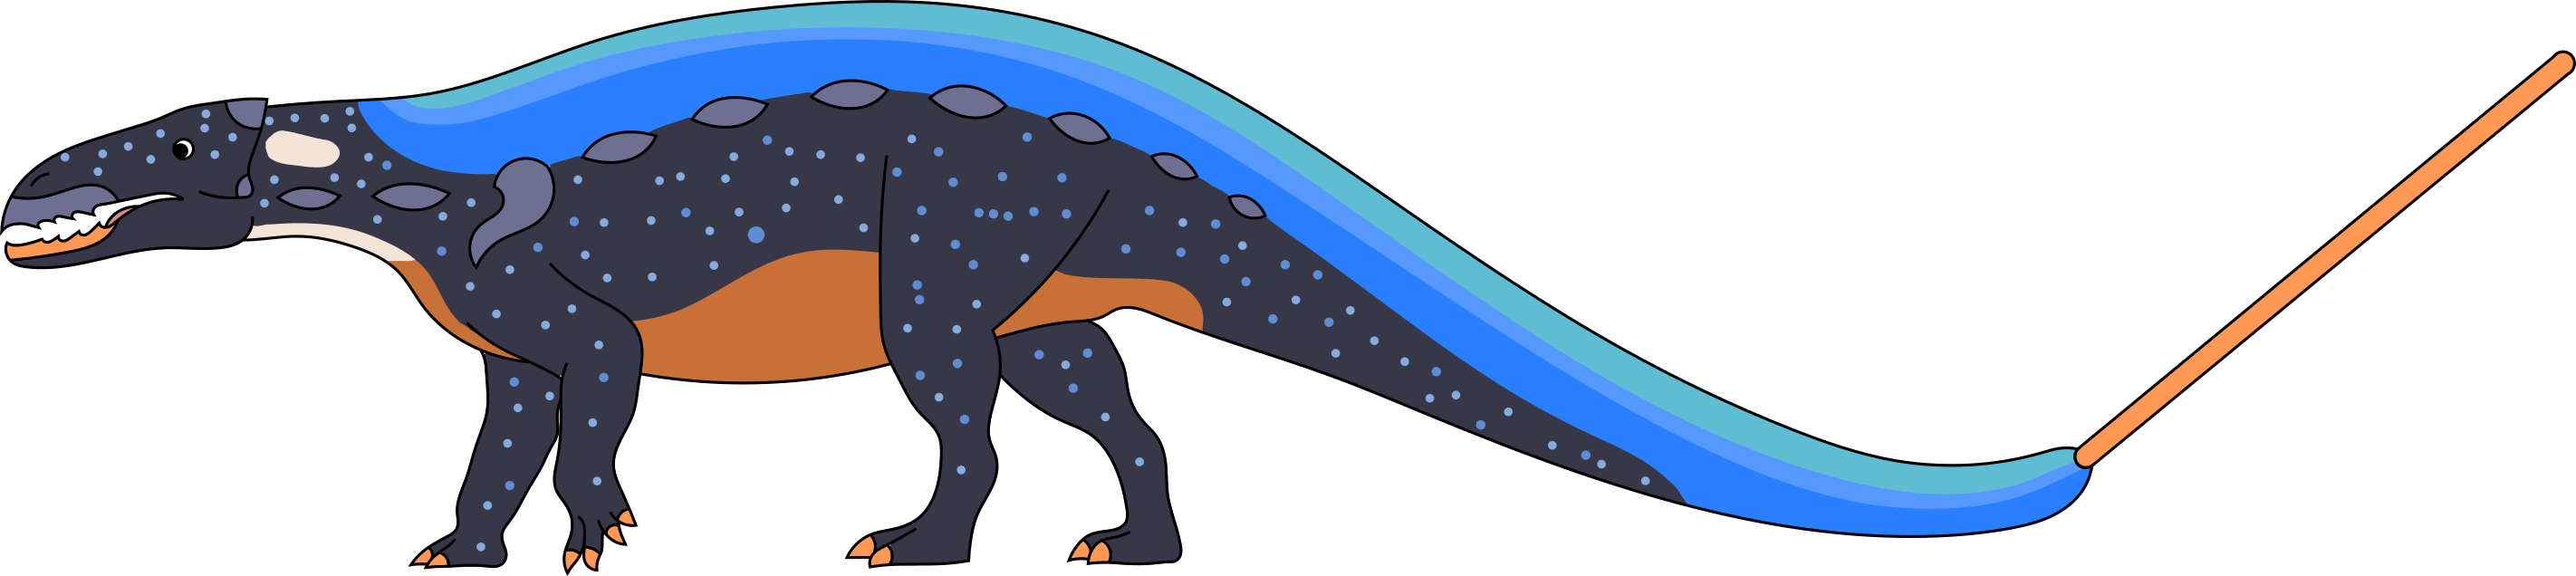 JWE complete Brachypodosaurus.png